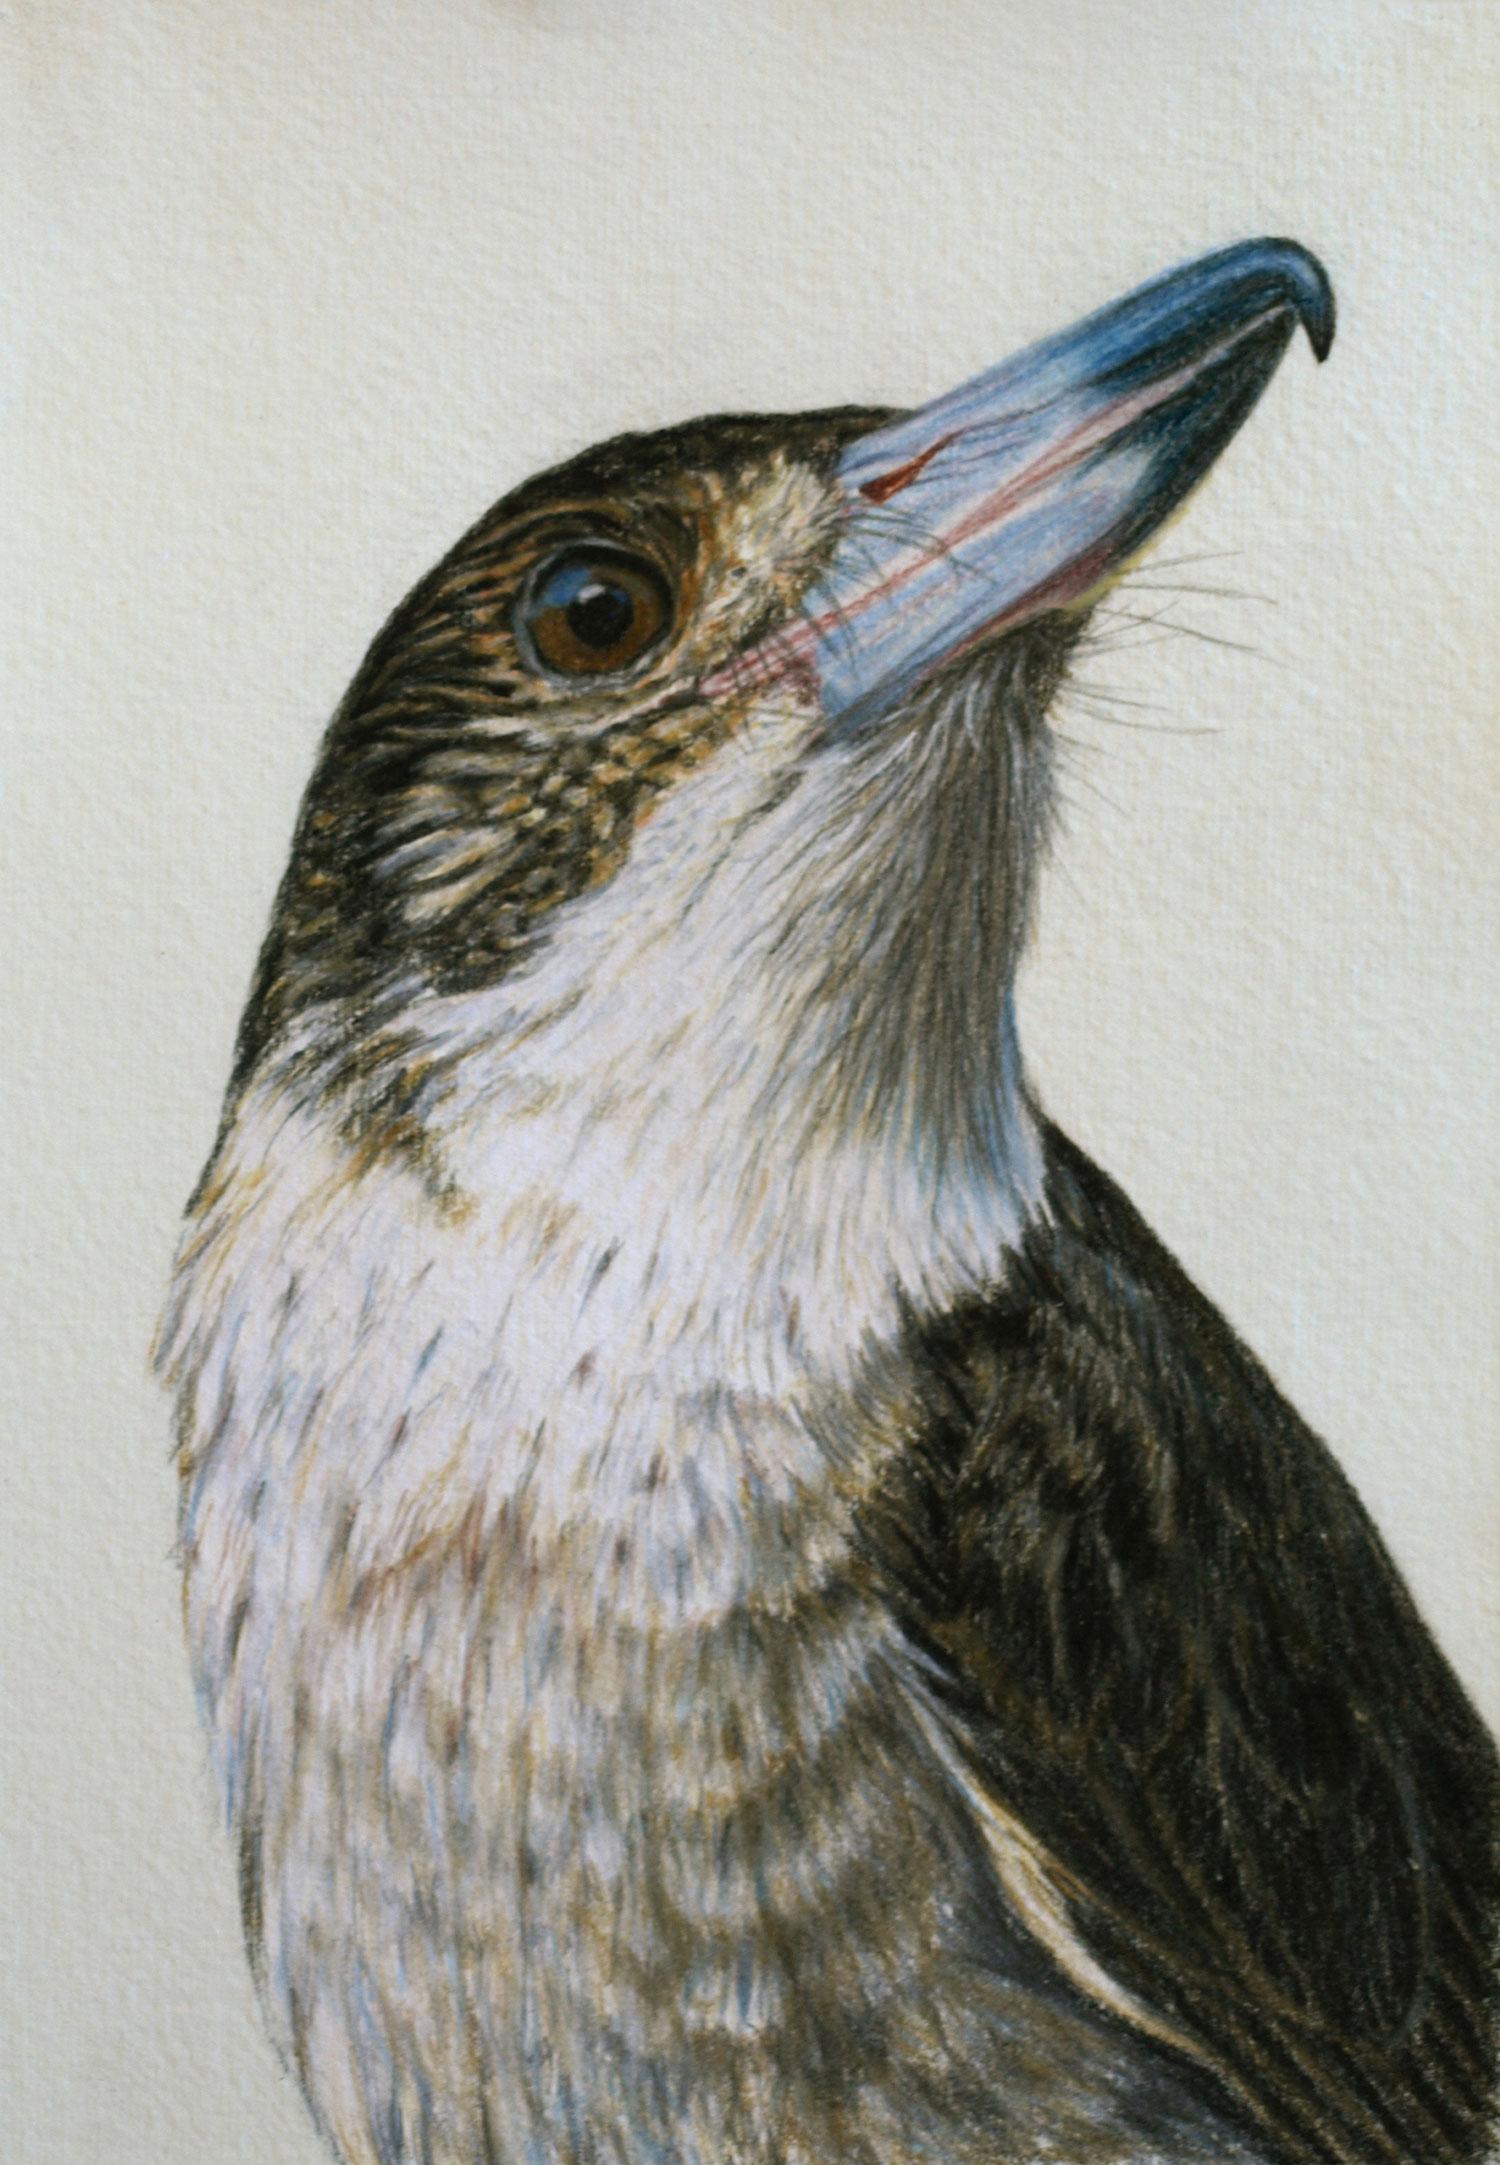 butcher-bird-2-drawing-rachel-newling.jpg